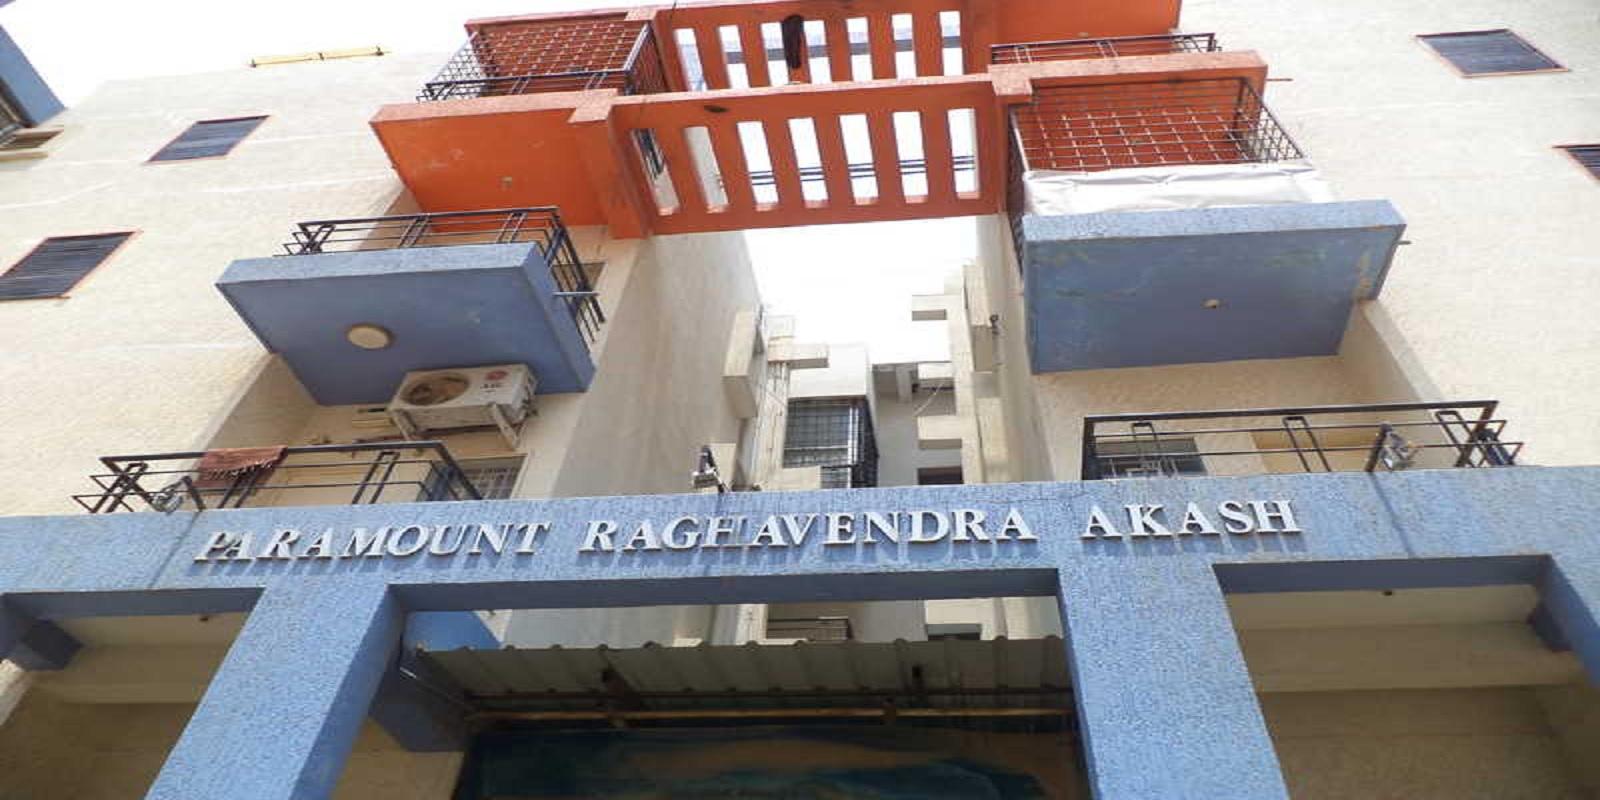 paramount raghavendra akash project project large image1